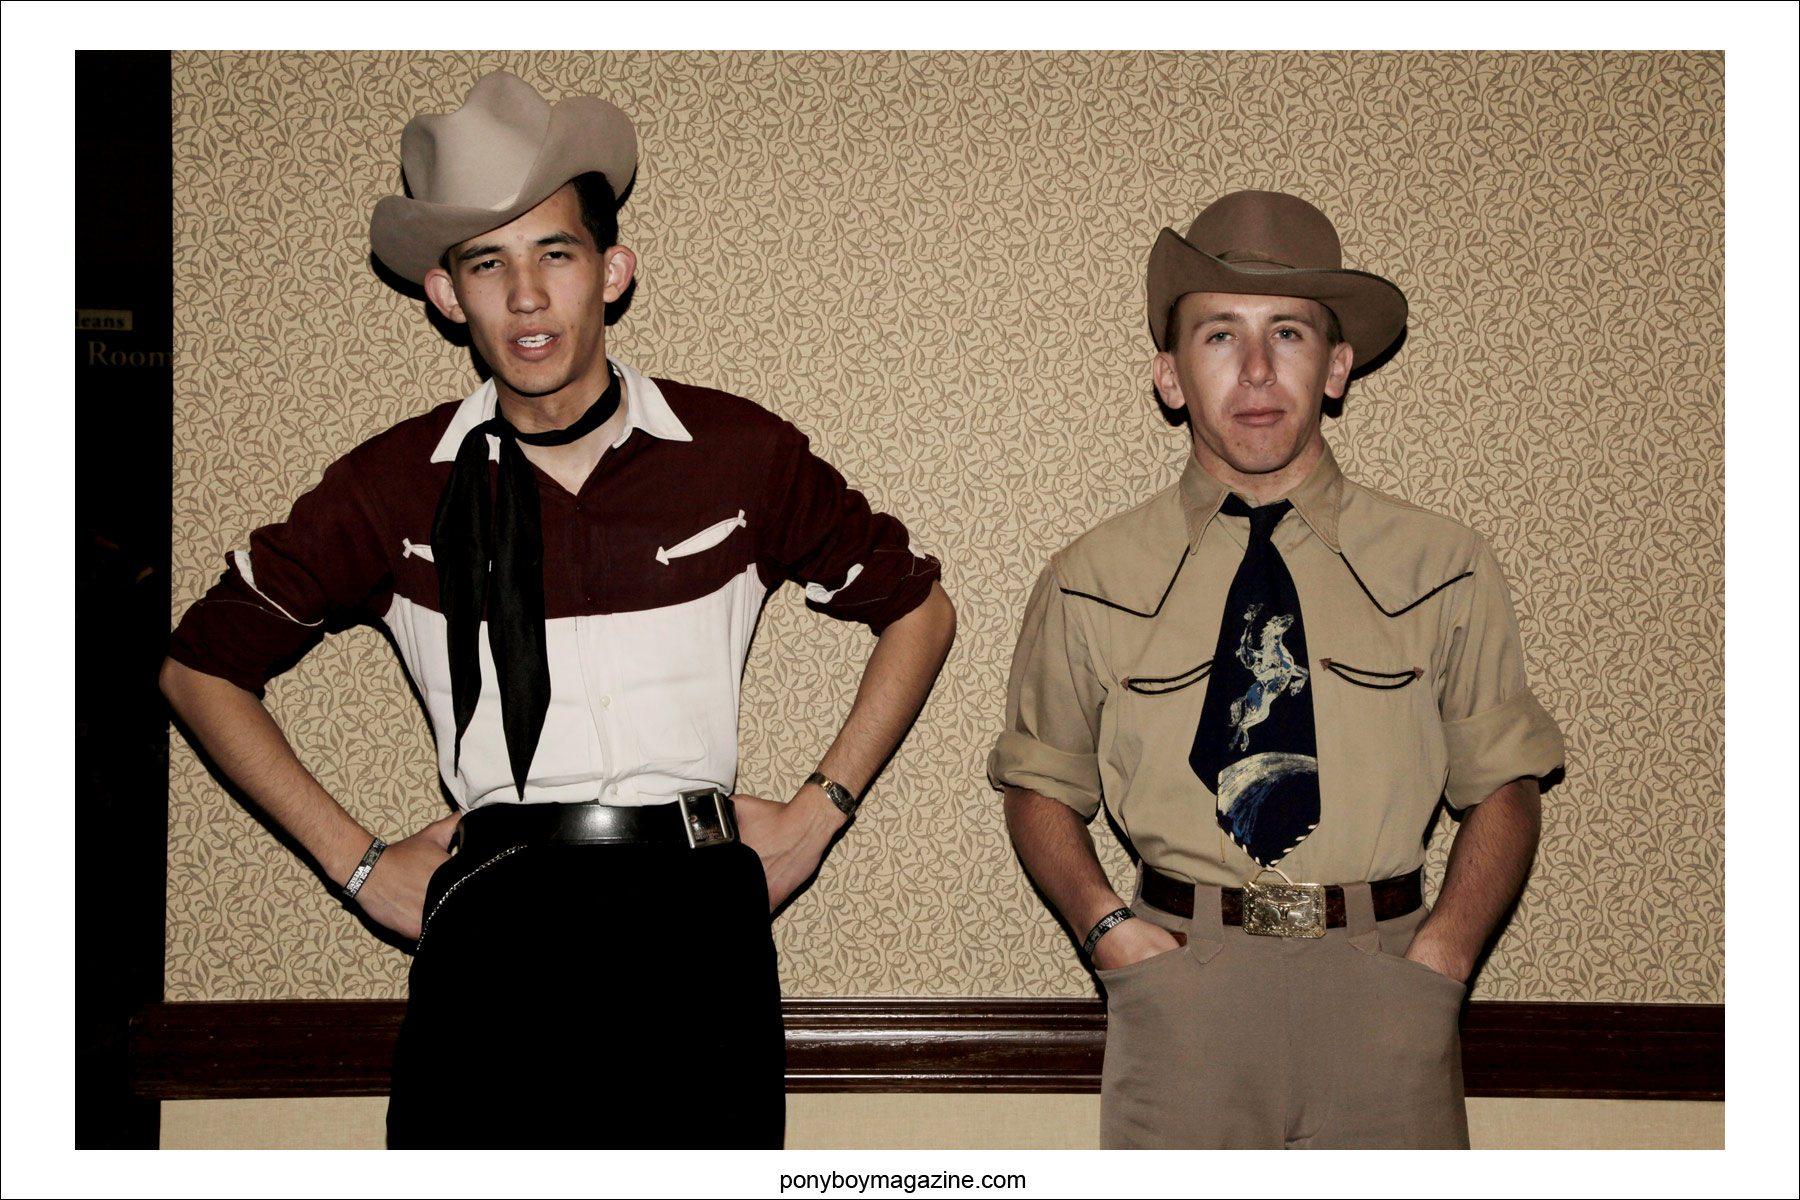 Viva Las Vegas western style gabardines, photographed by Alexander Thompson for Ponyboy Magazine.